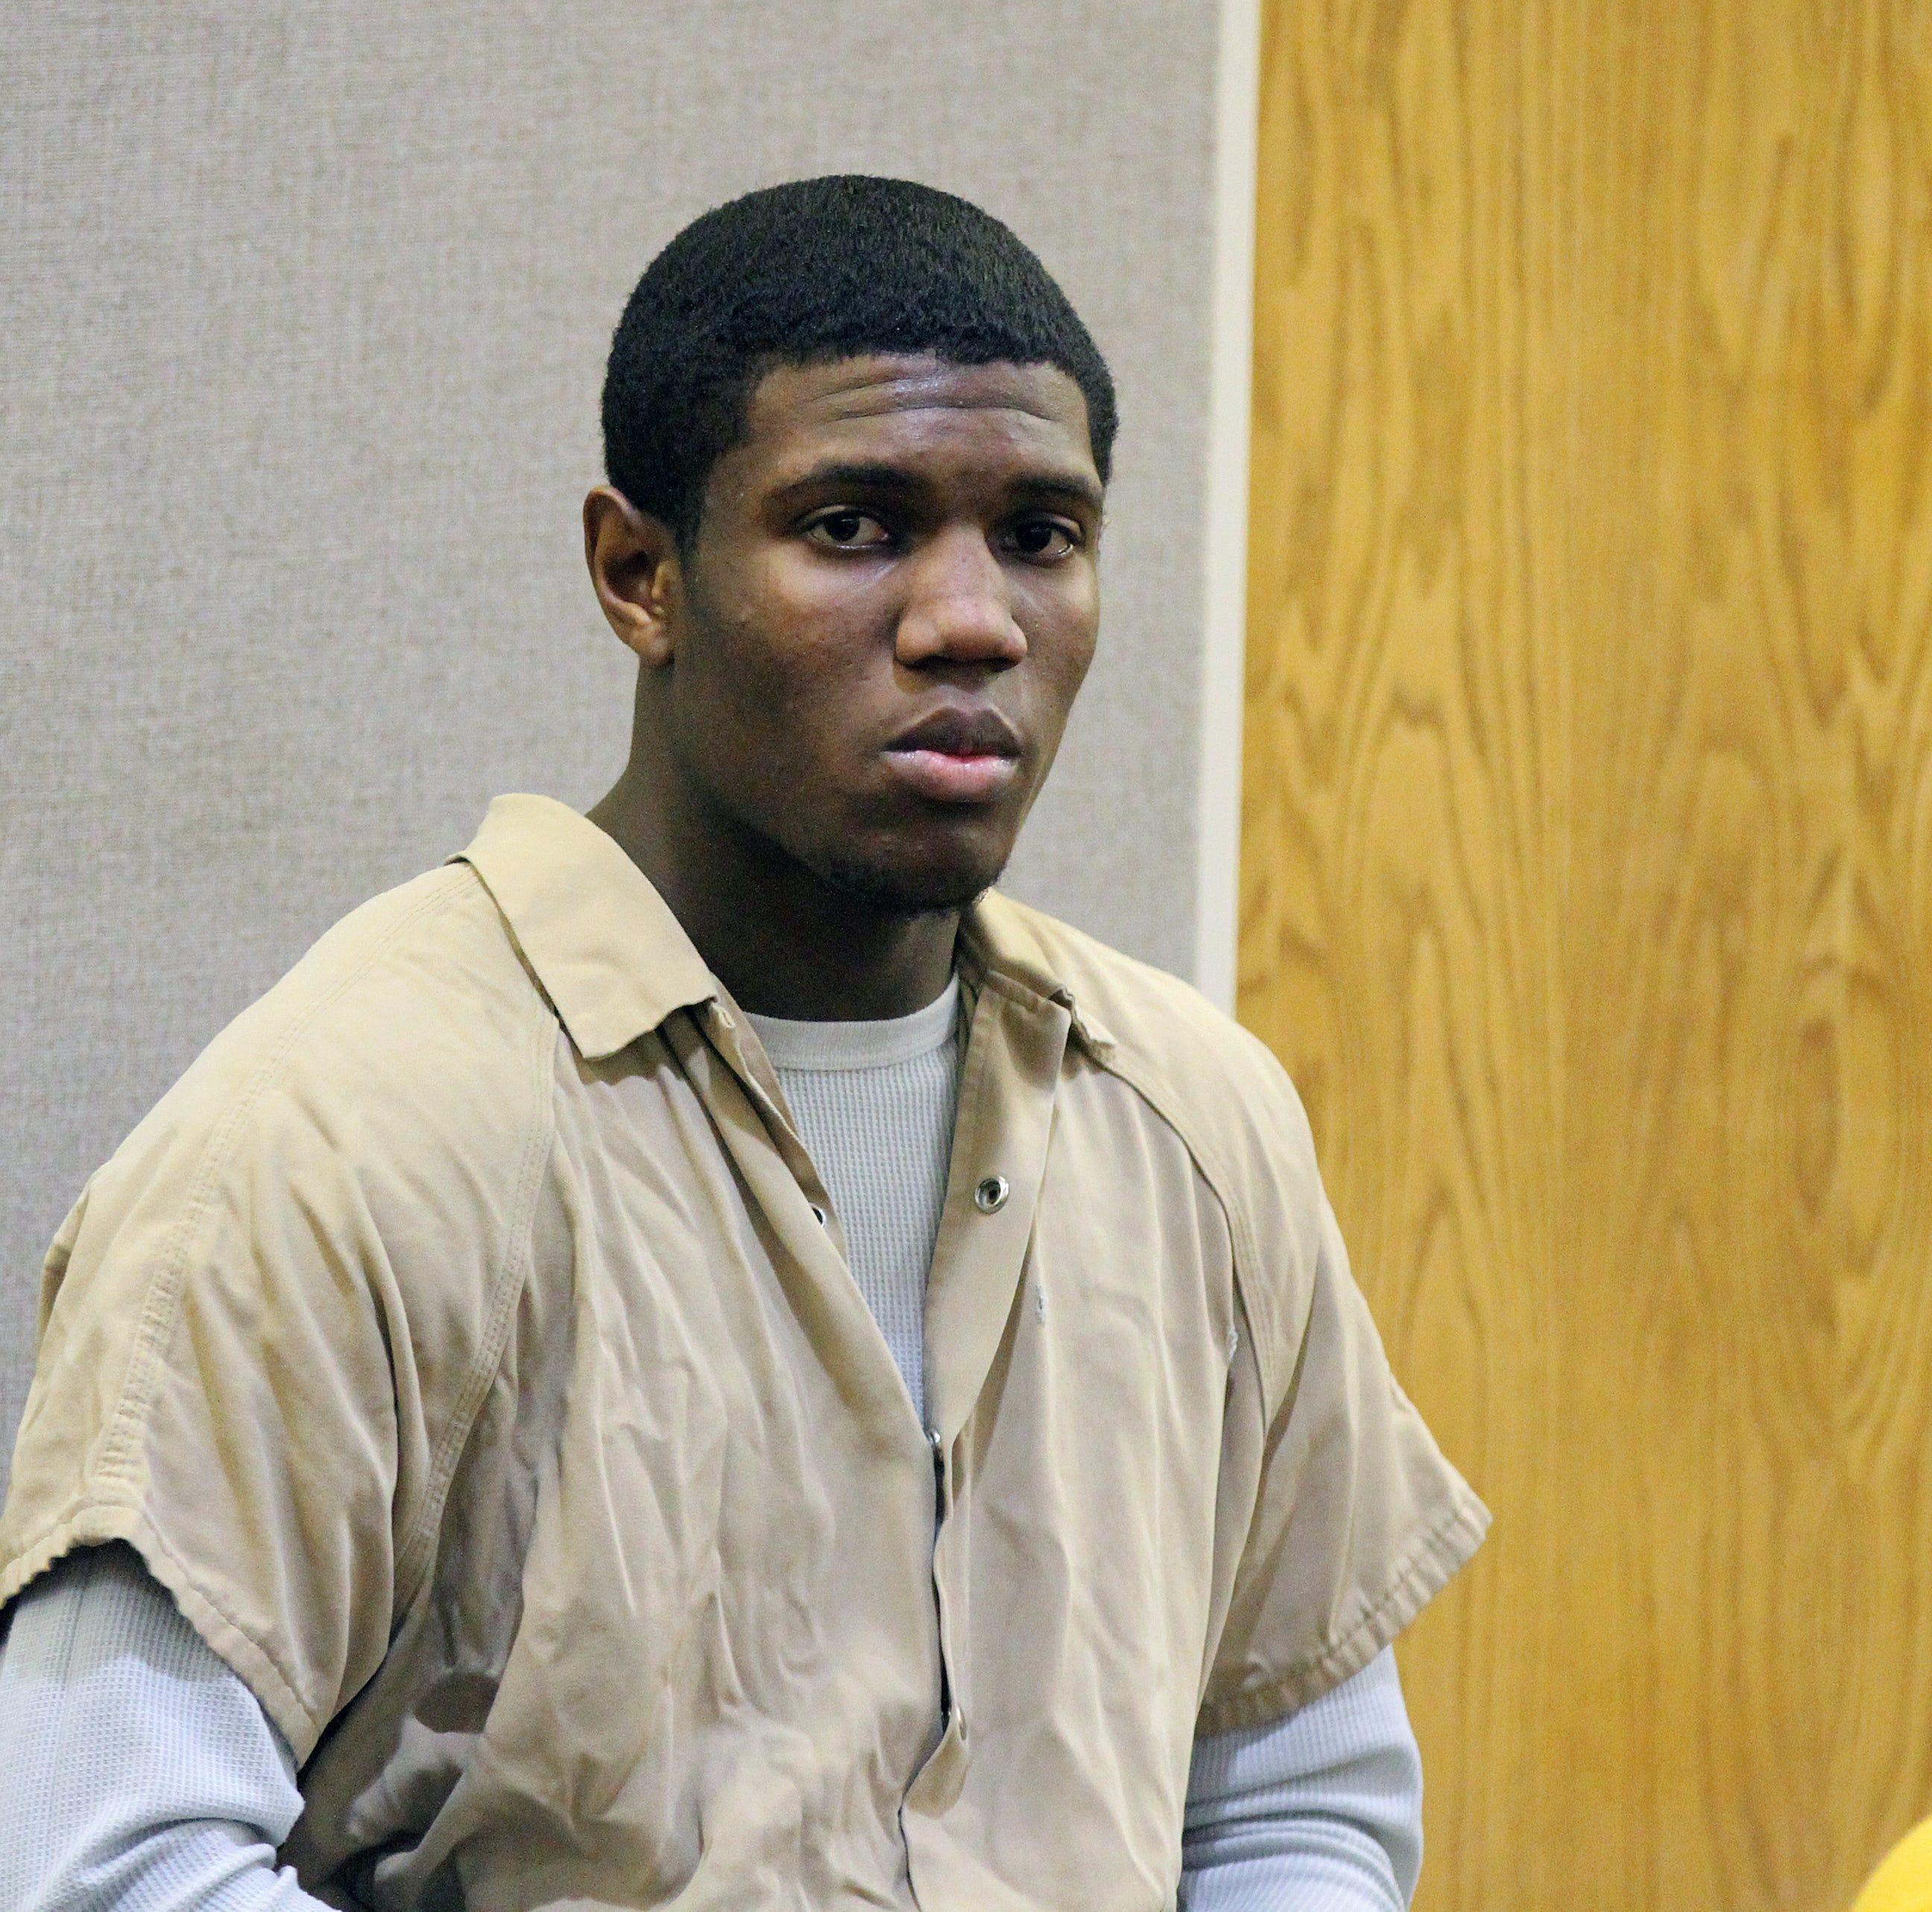 Asbury killing: 2 Neptune teens plead guilty in 10-year-old's death